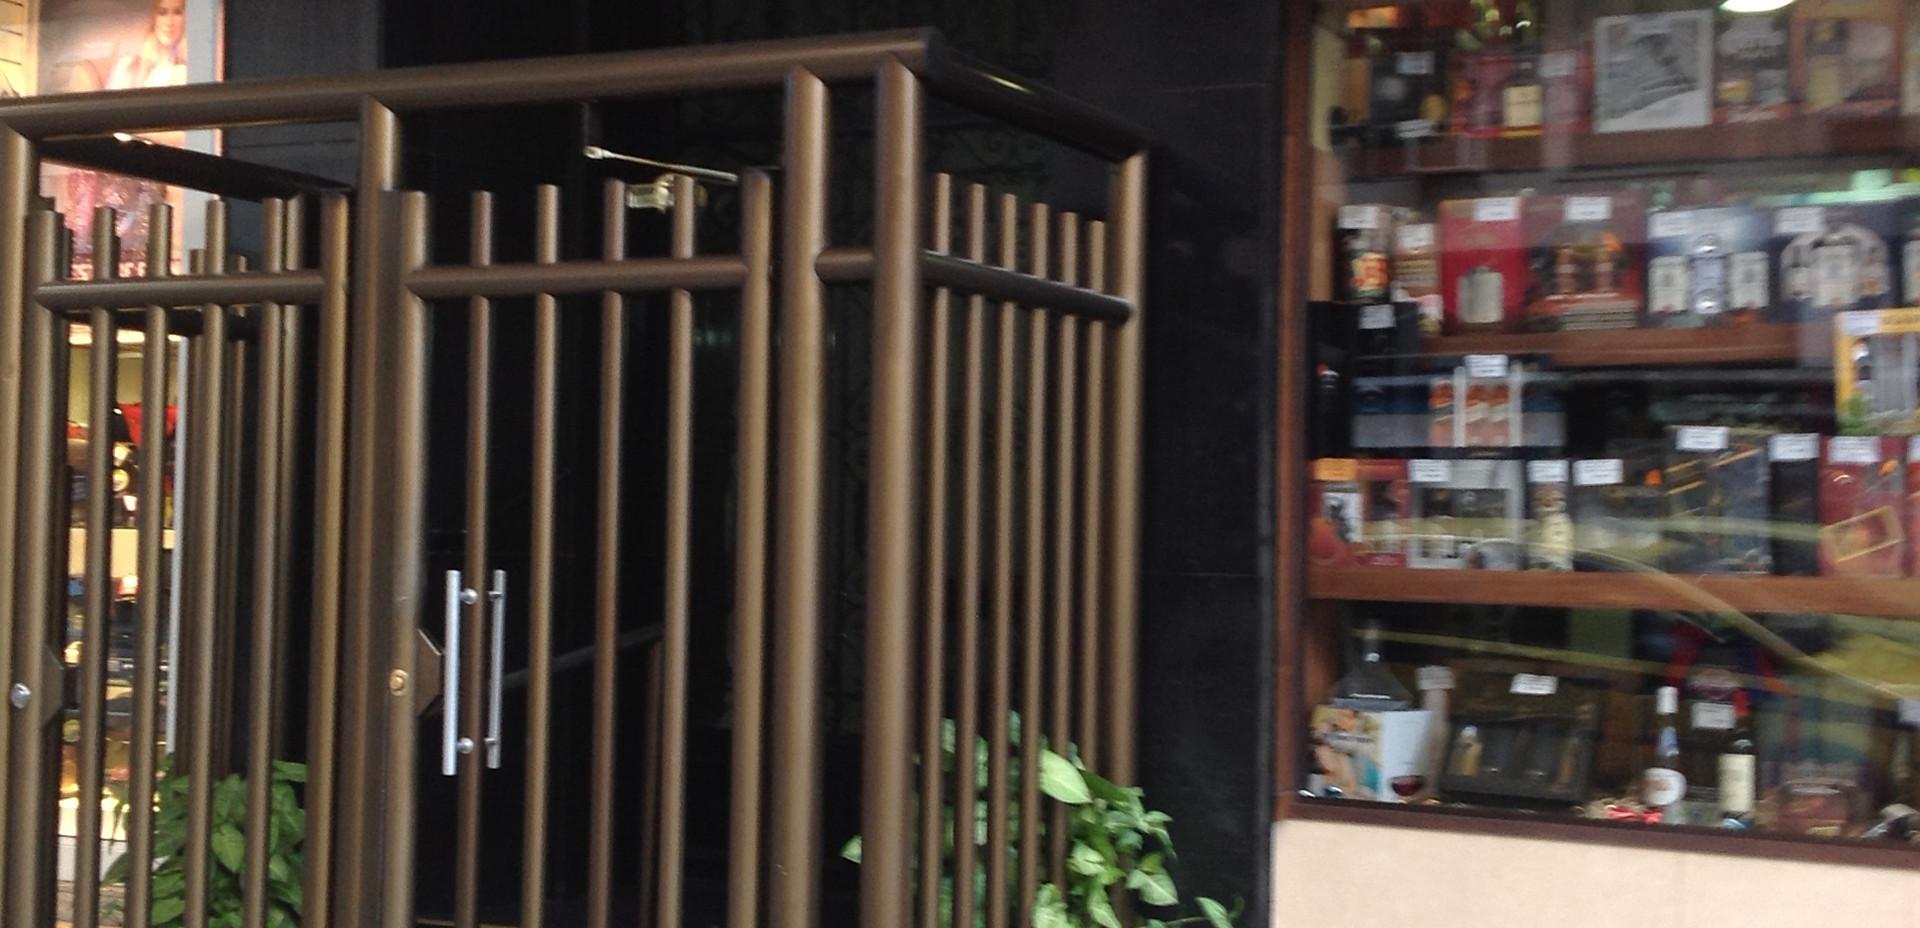 avenida copacabana 960 apt 406 jus 1004.